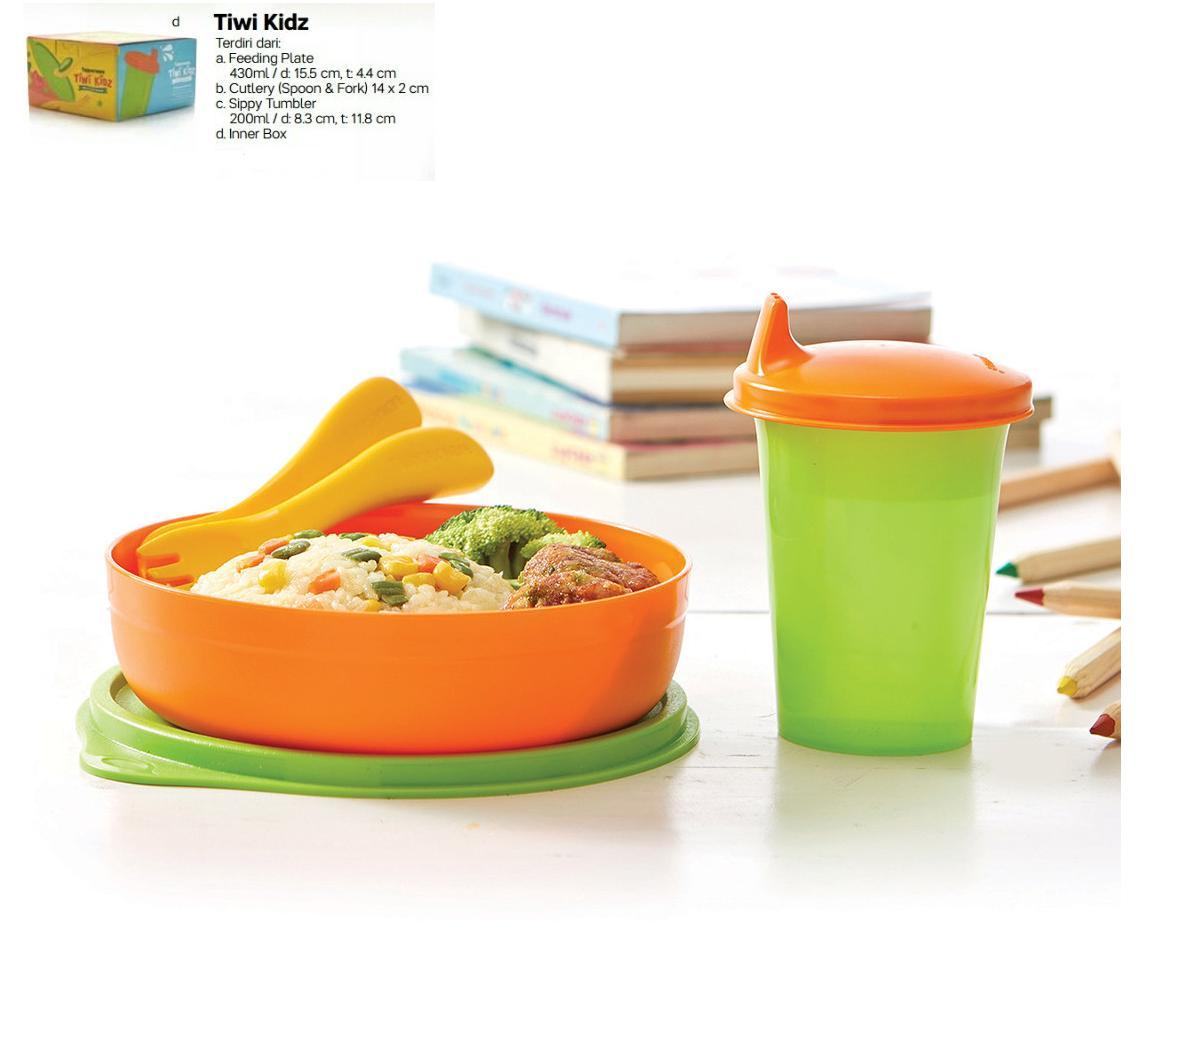 Tupperware Tiwi kids set - alat makan set untuk bayi